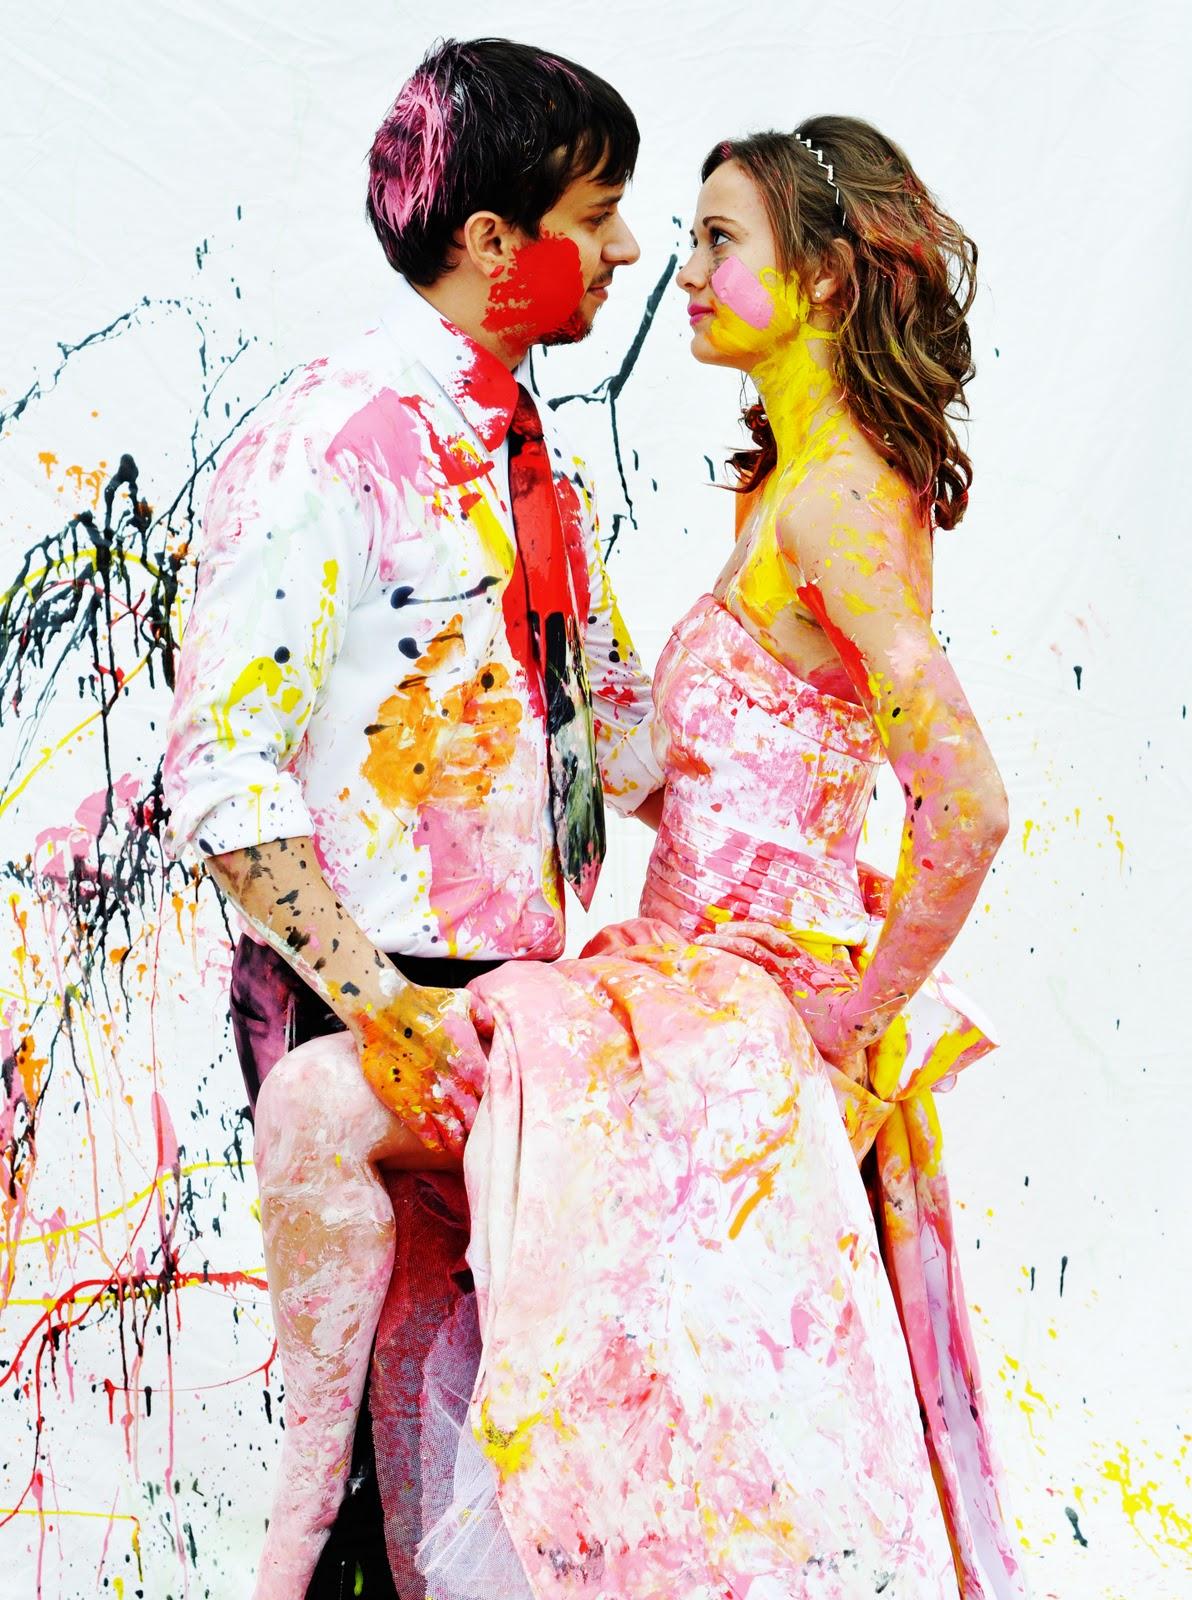 Trash the dress paint